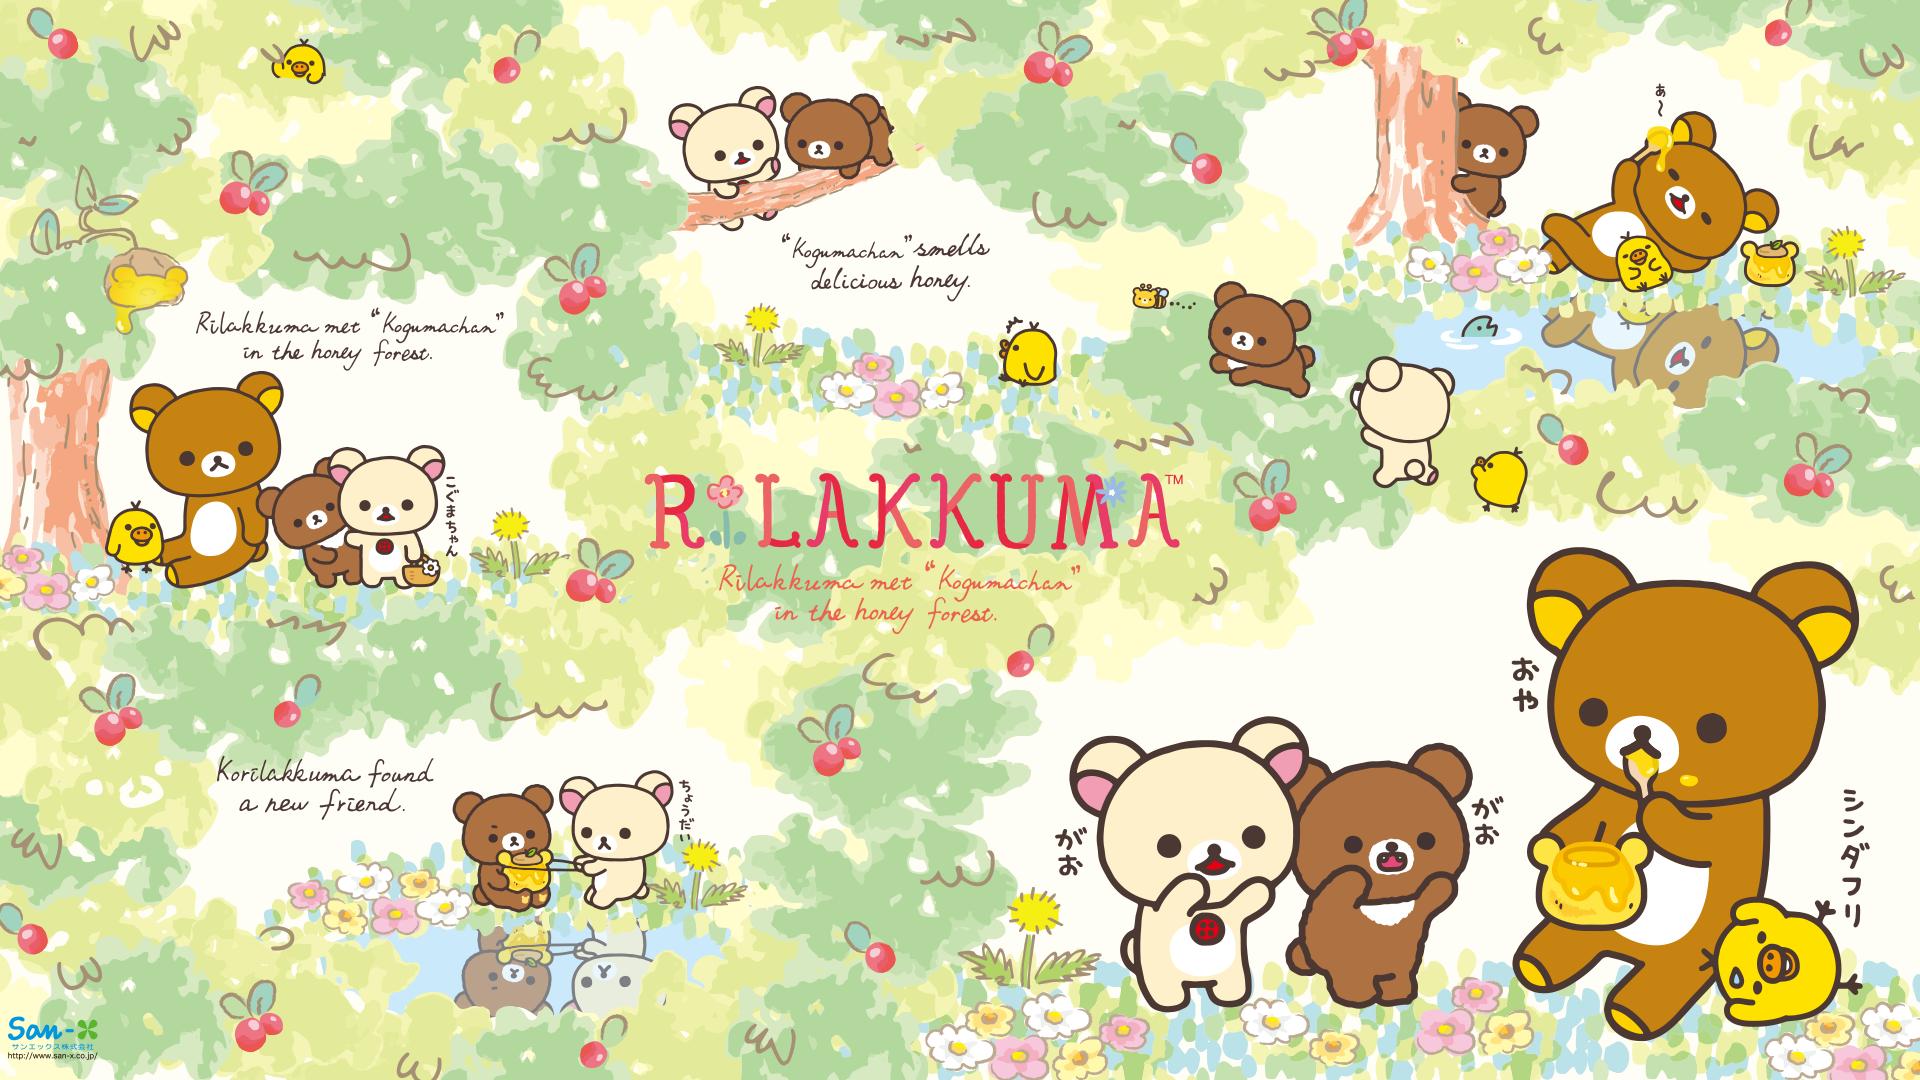 rilakkuma 3 wallpaper by - photo #32